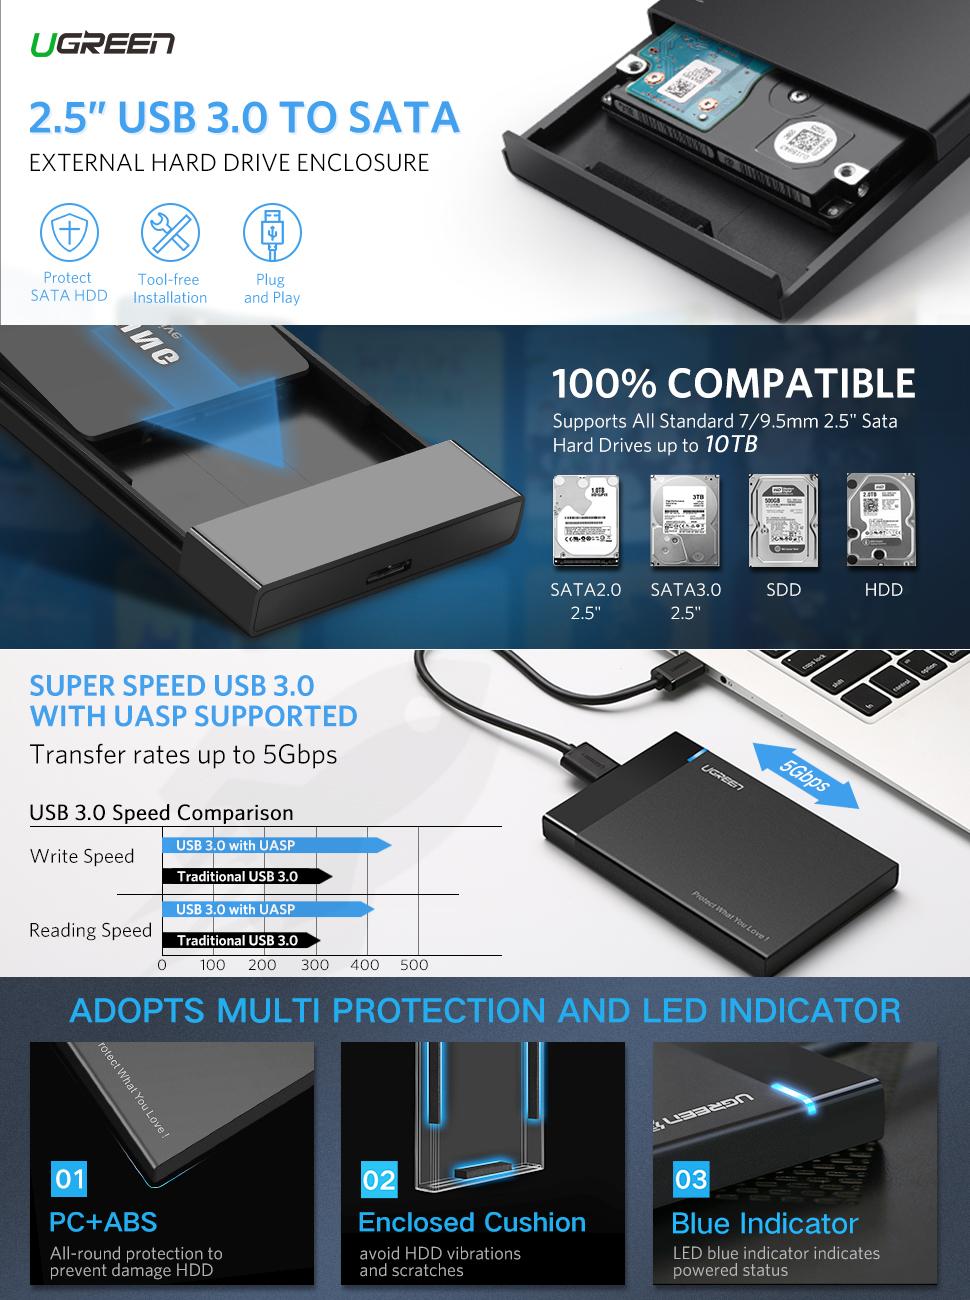 Harga Toshiba Canvio Simple Ii Hard Disk Eksternal 500 Gb 25ampquot Wd Element 1tb Harddisk External Usb 30 Resmi Ugreen Drive Enclosure Adapter To